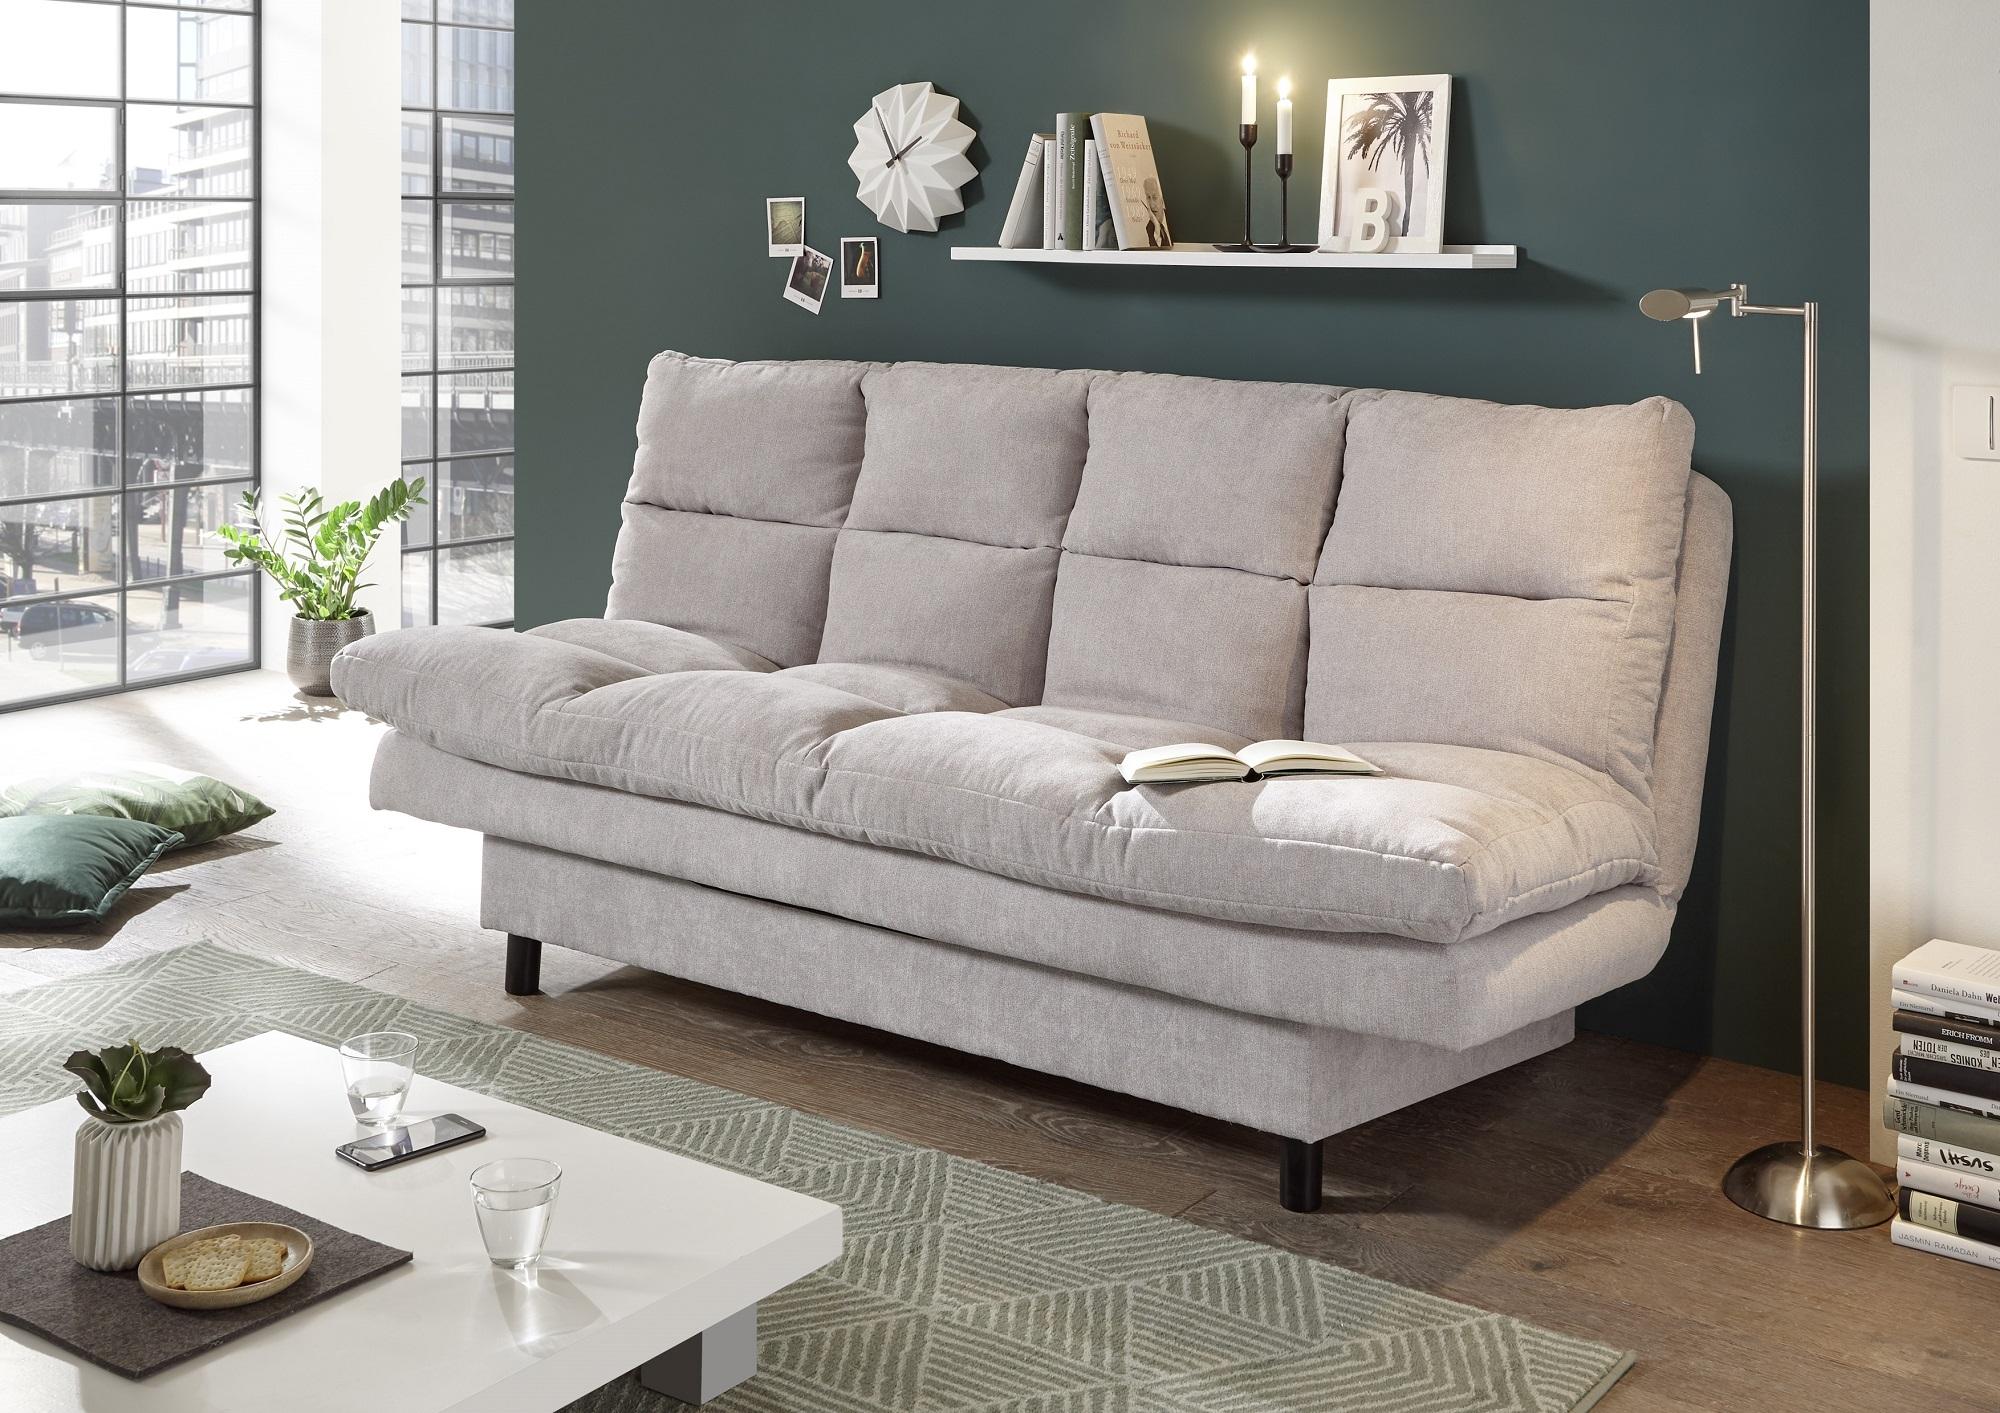 Canapea extensibila tapitata cu stofa, 3 locuri Lotta Gri, l190xA95xH85 cm